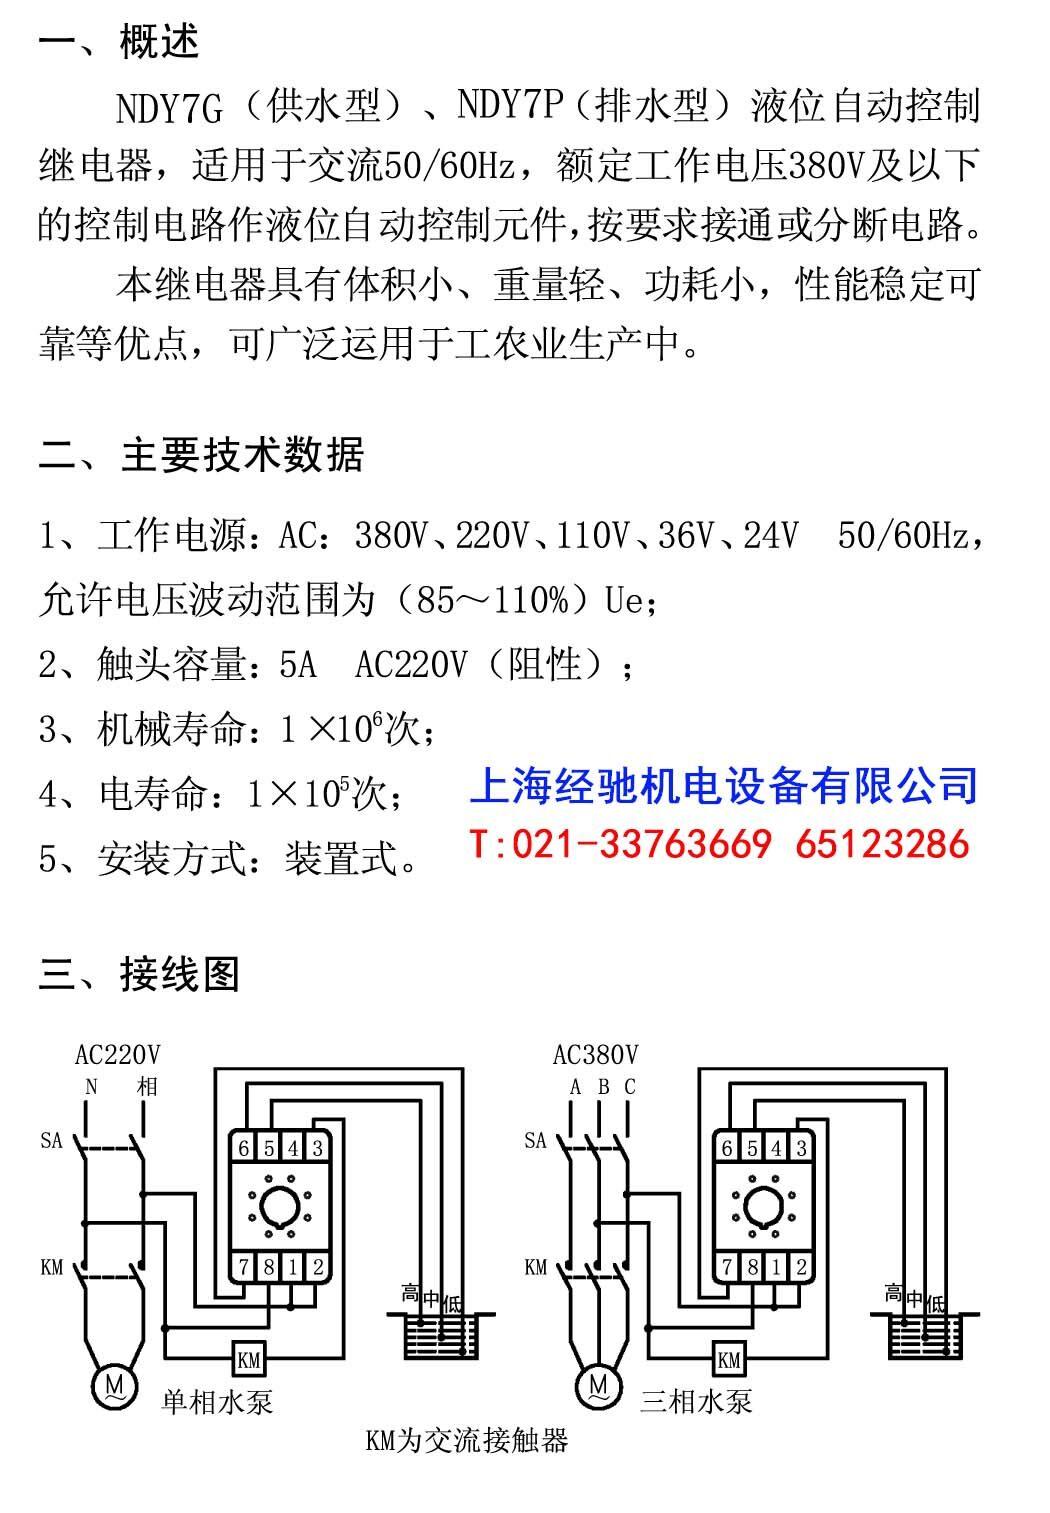 ndy7g(jyb-714)液位继电器